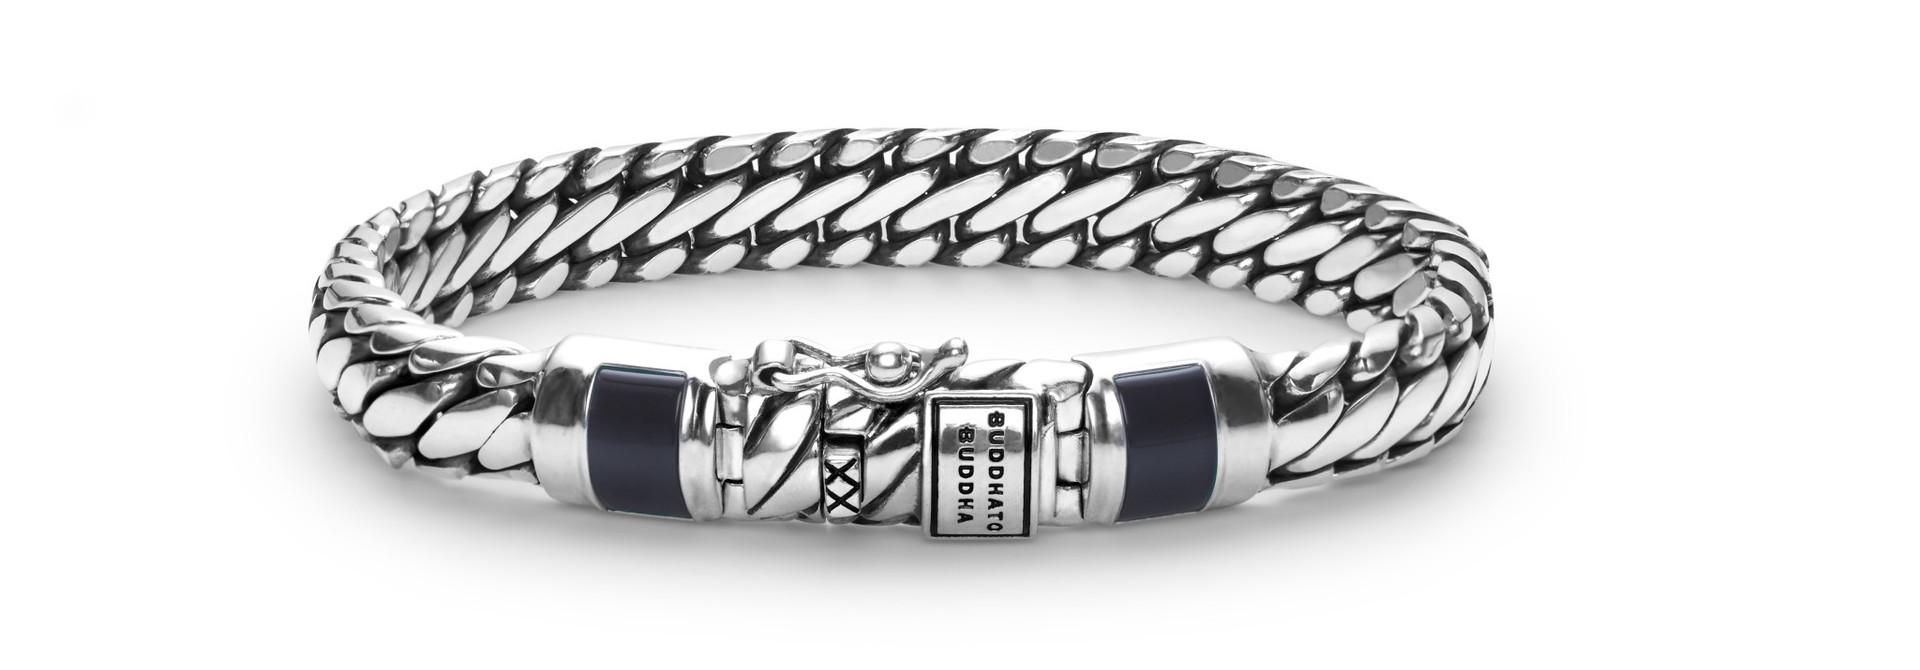 Ben XS Stone Bracelet Onyx